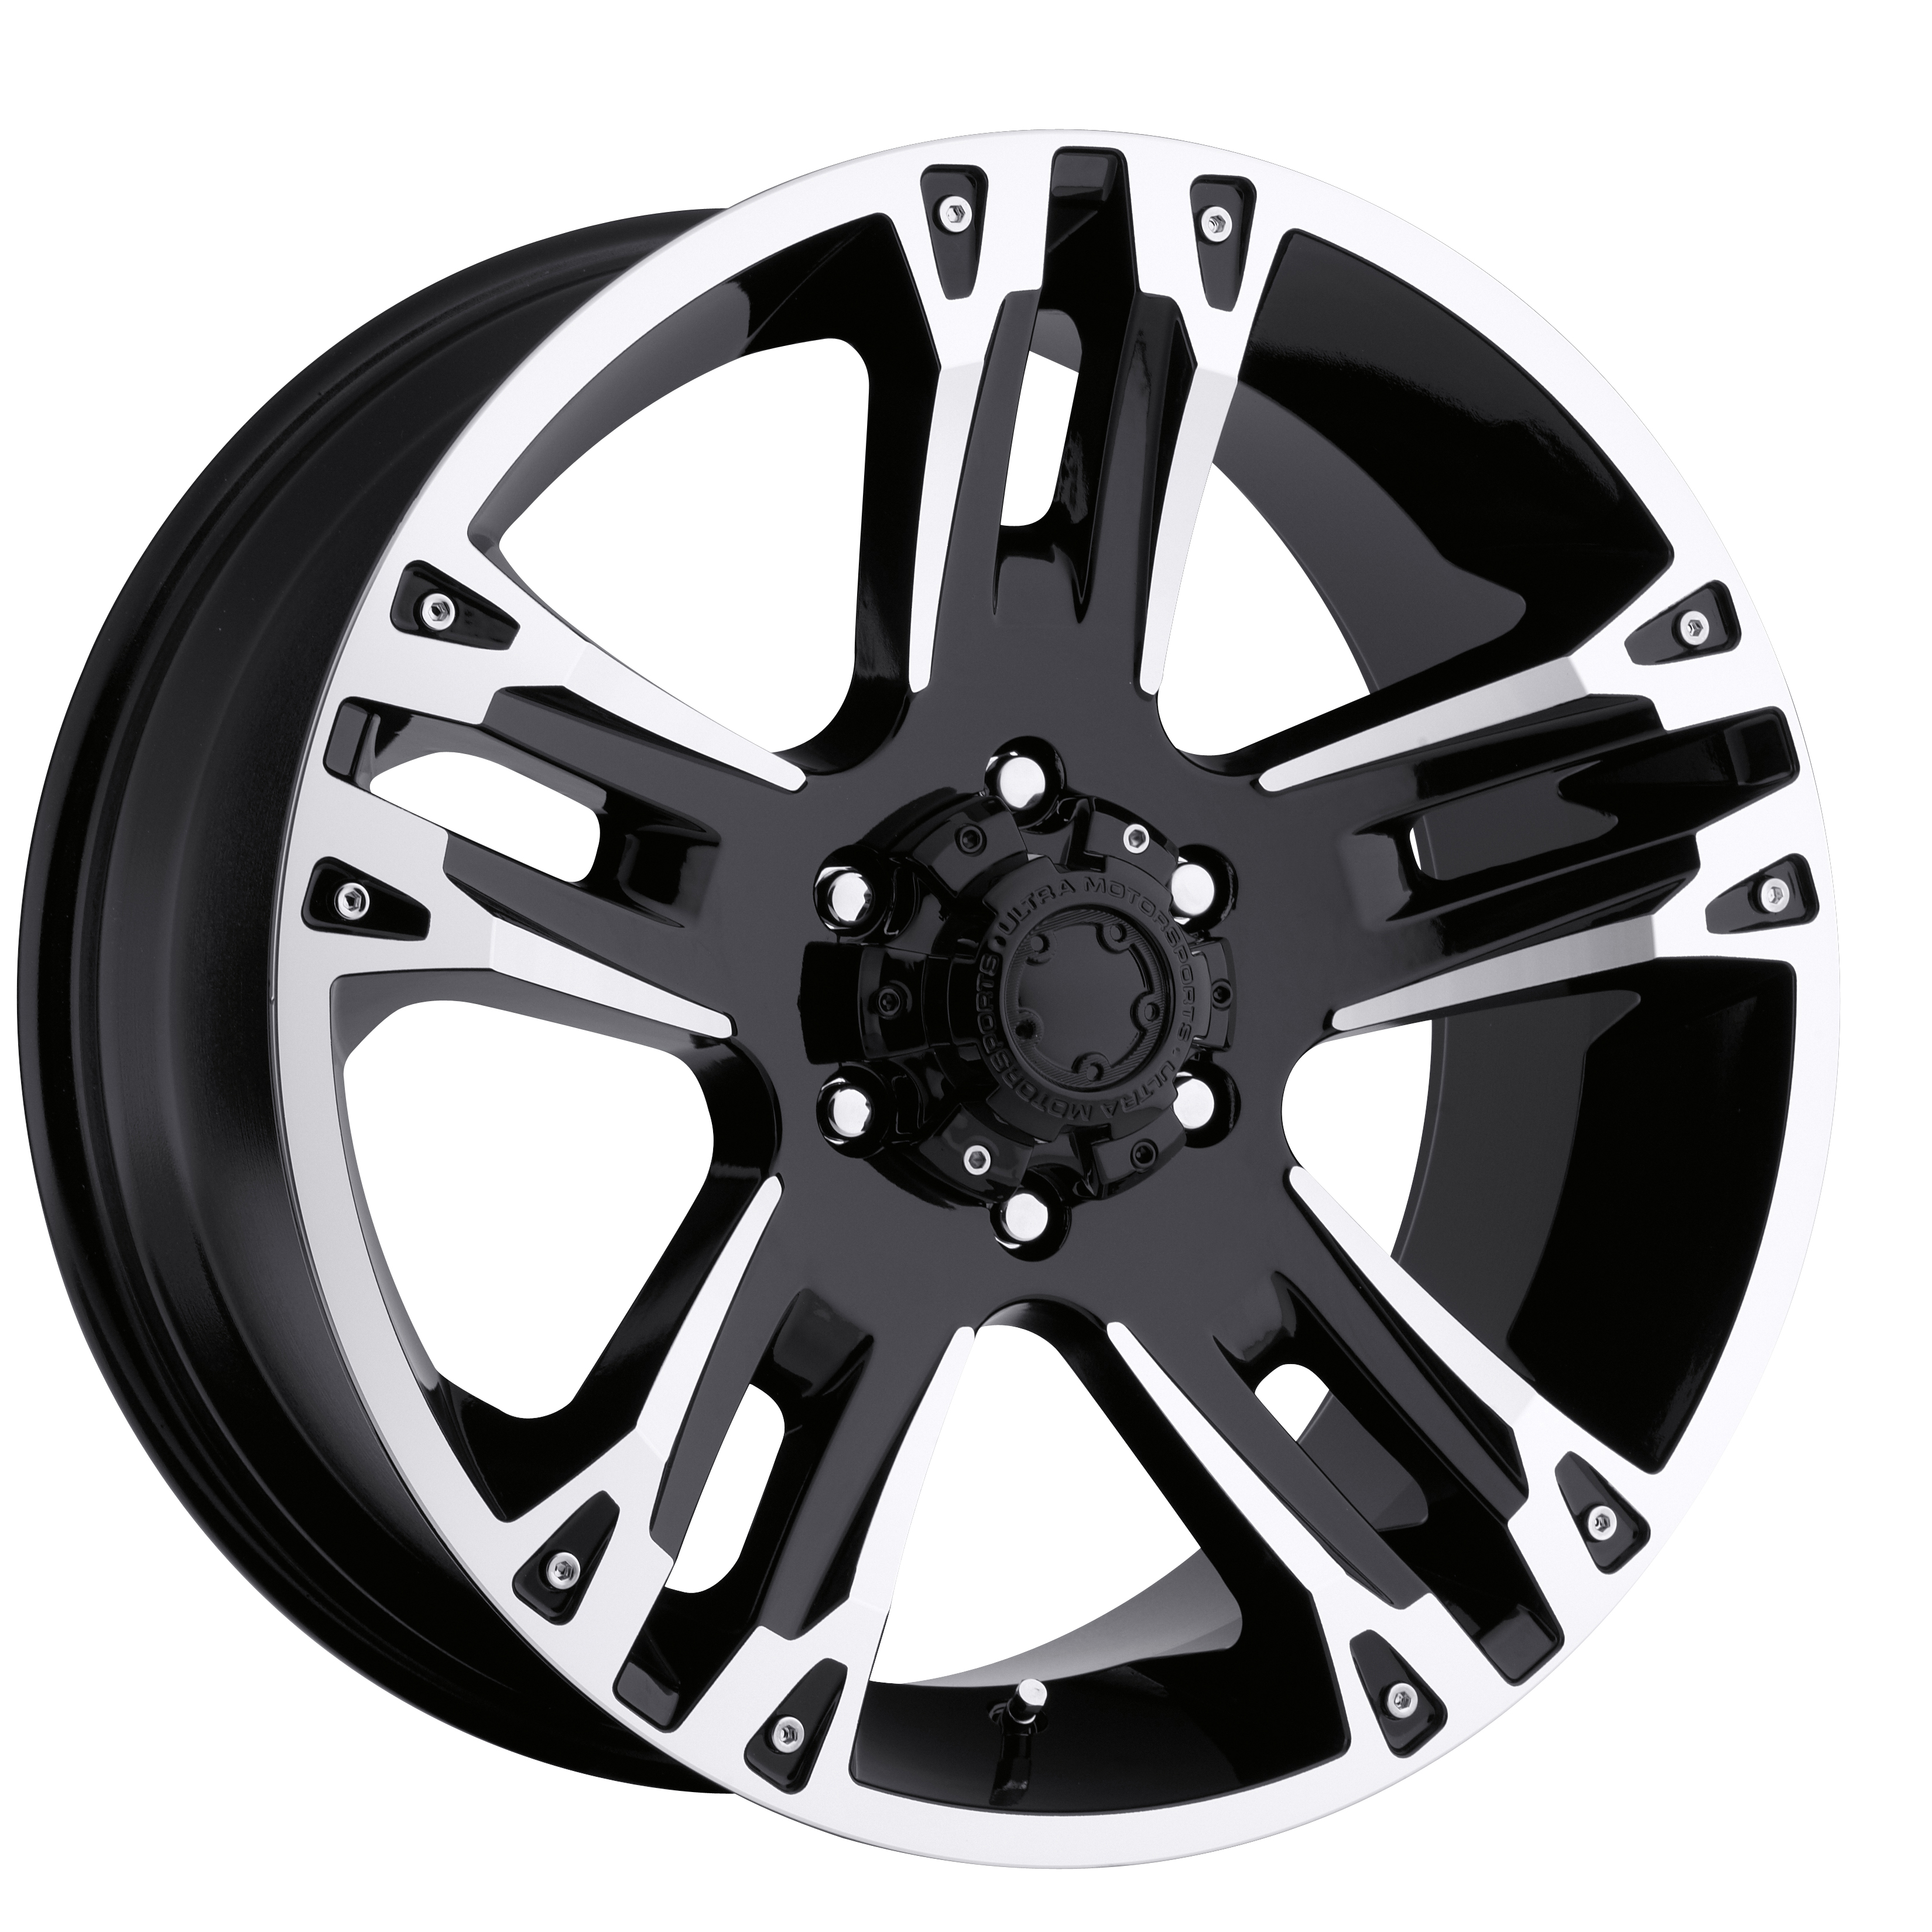 Ultra Wheel 235-7863B Wheel Maverick 234/235  - image 1 of 1